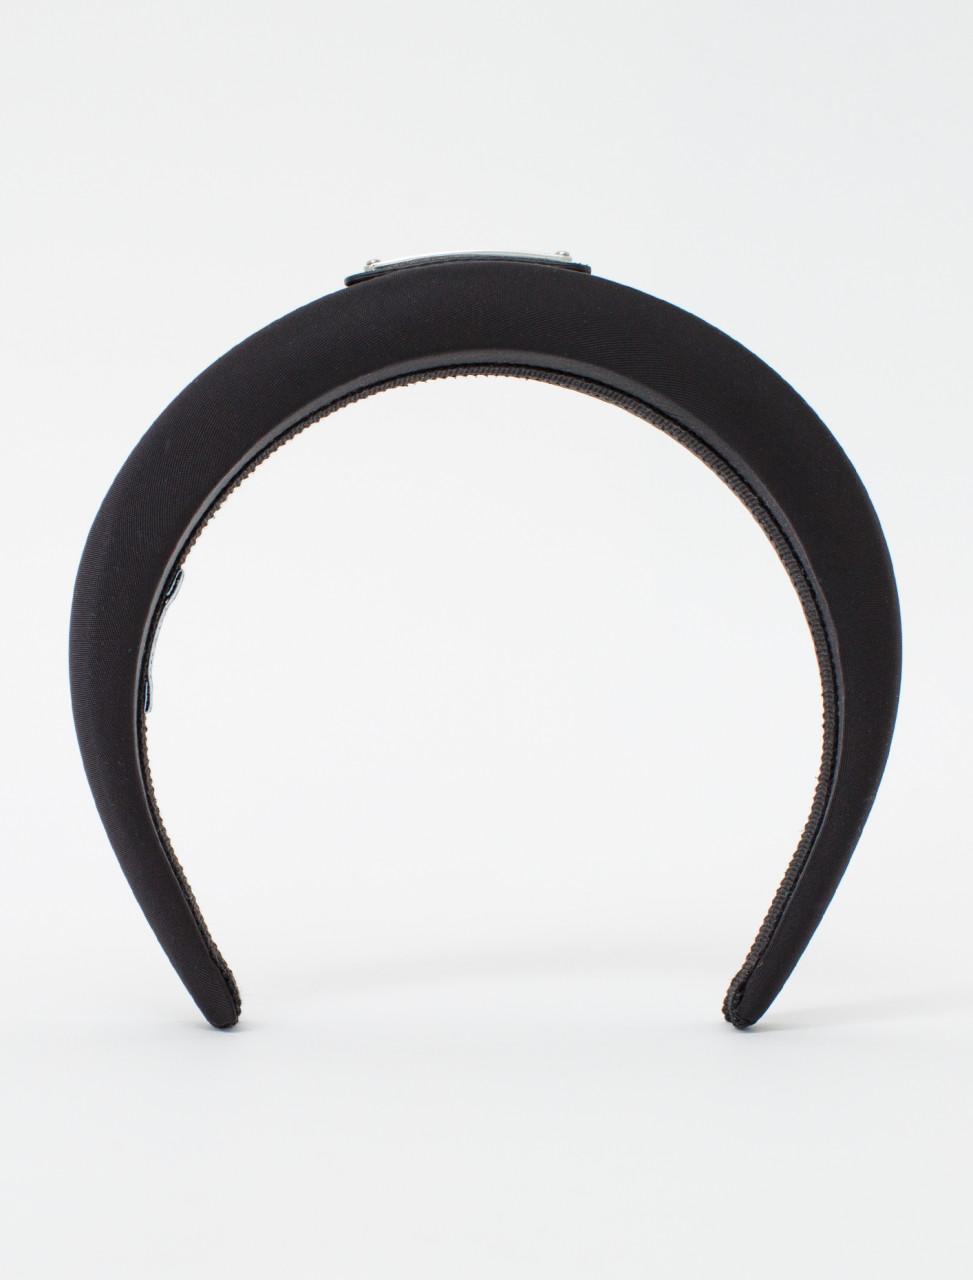 Fabric Headband in Black